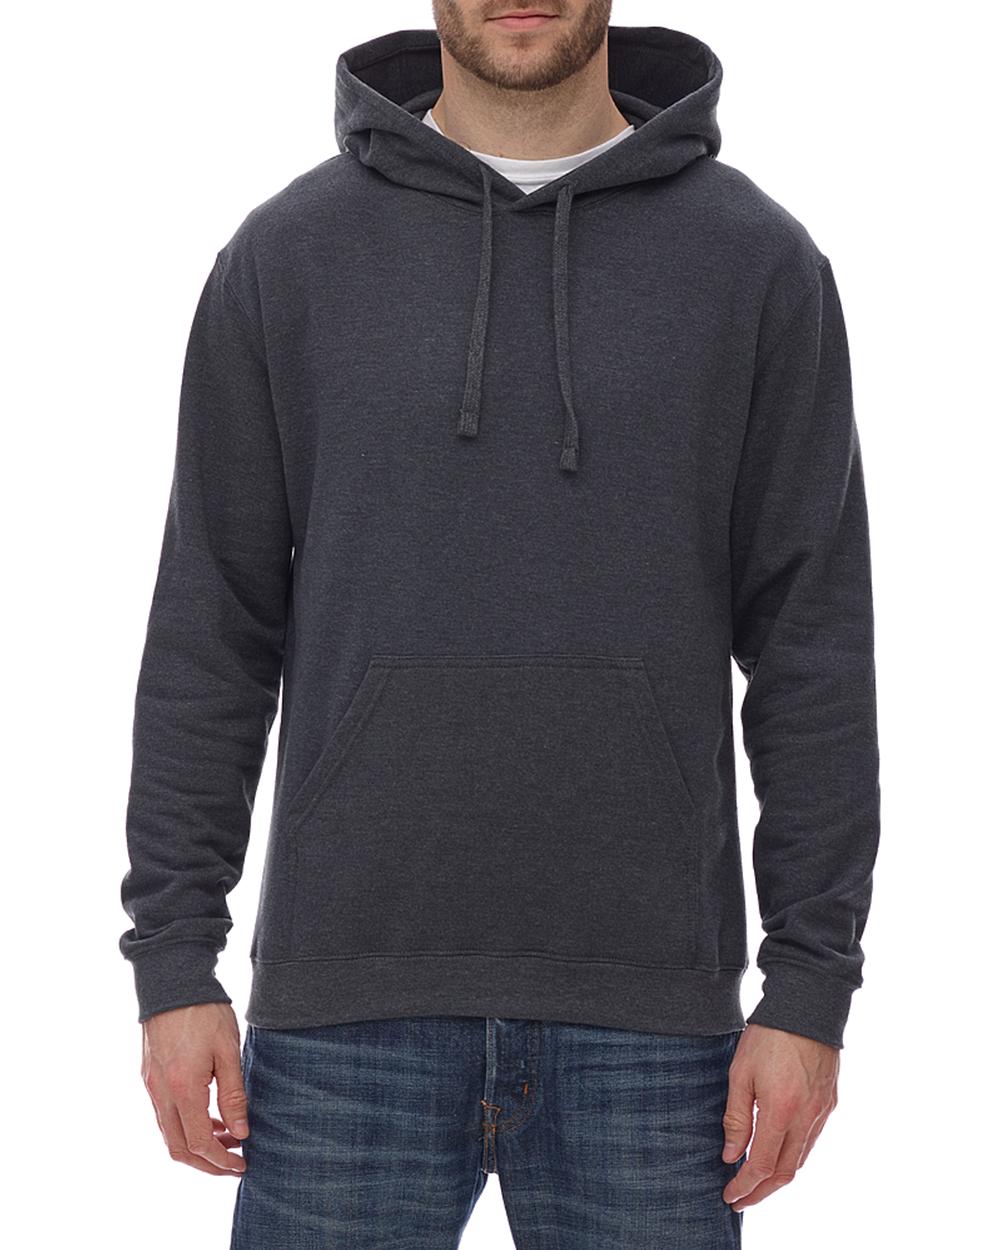 Unisex Pullover Hooded Sweatshirt